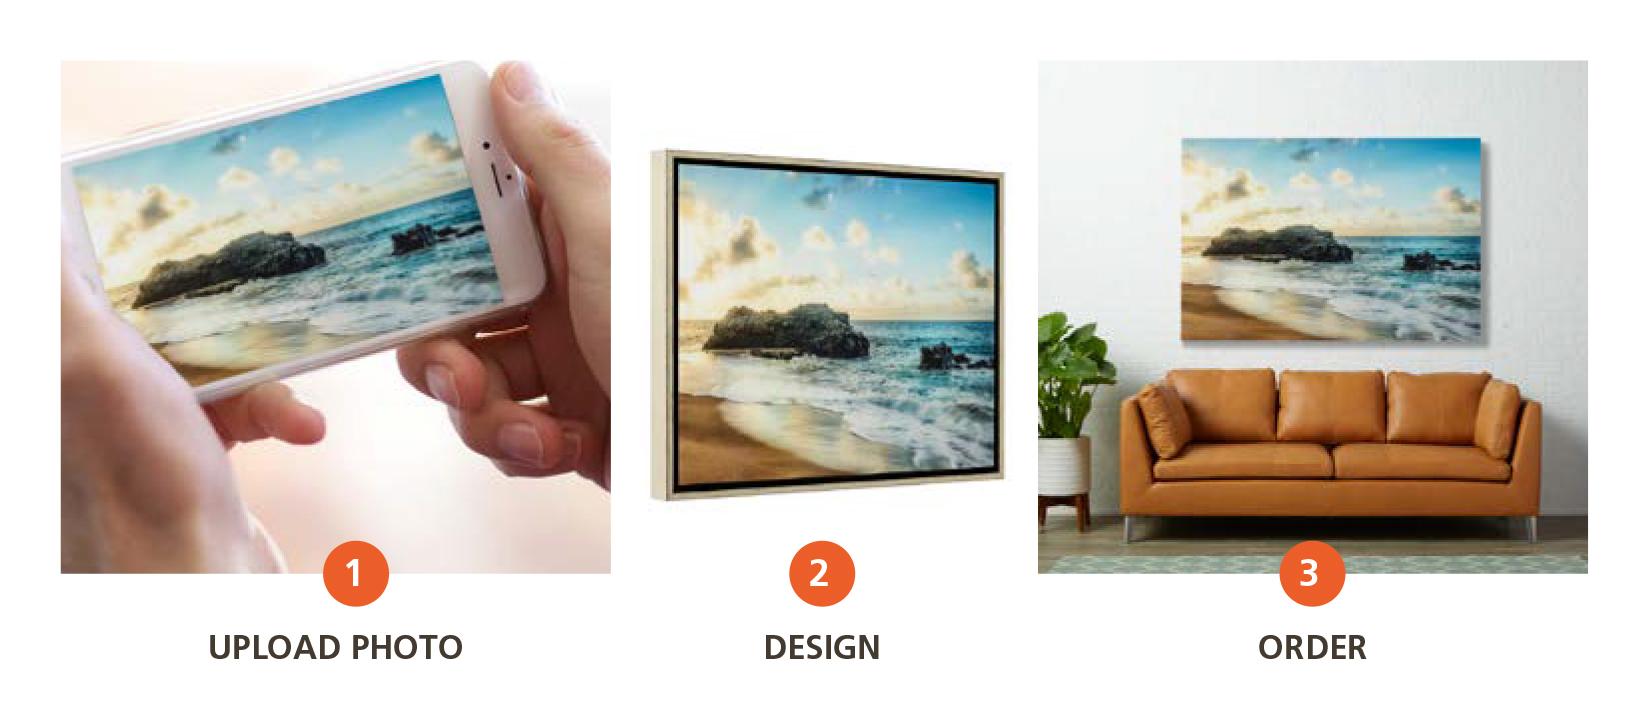 Gallery-Moments-Promo-Cardscrop.jpg